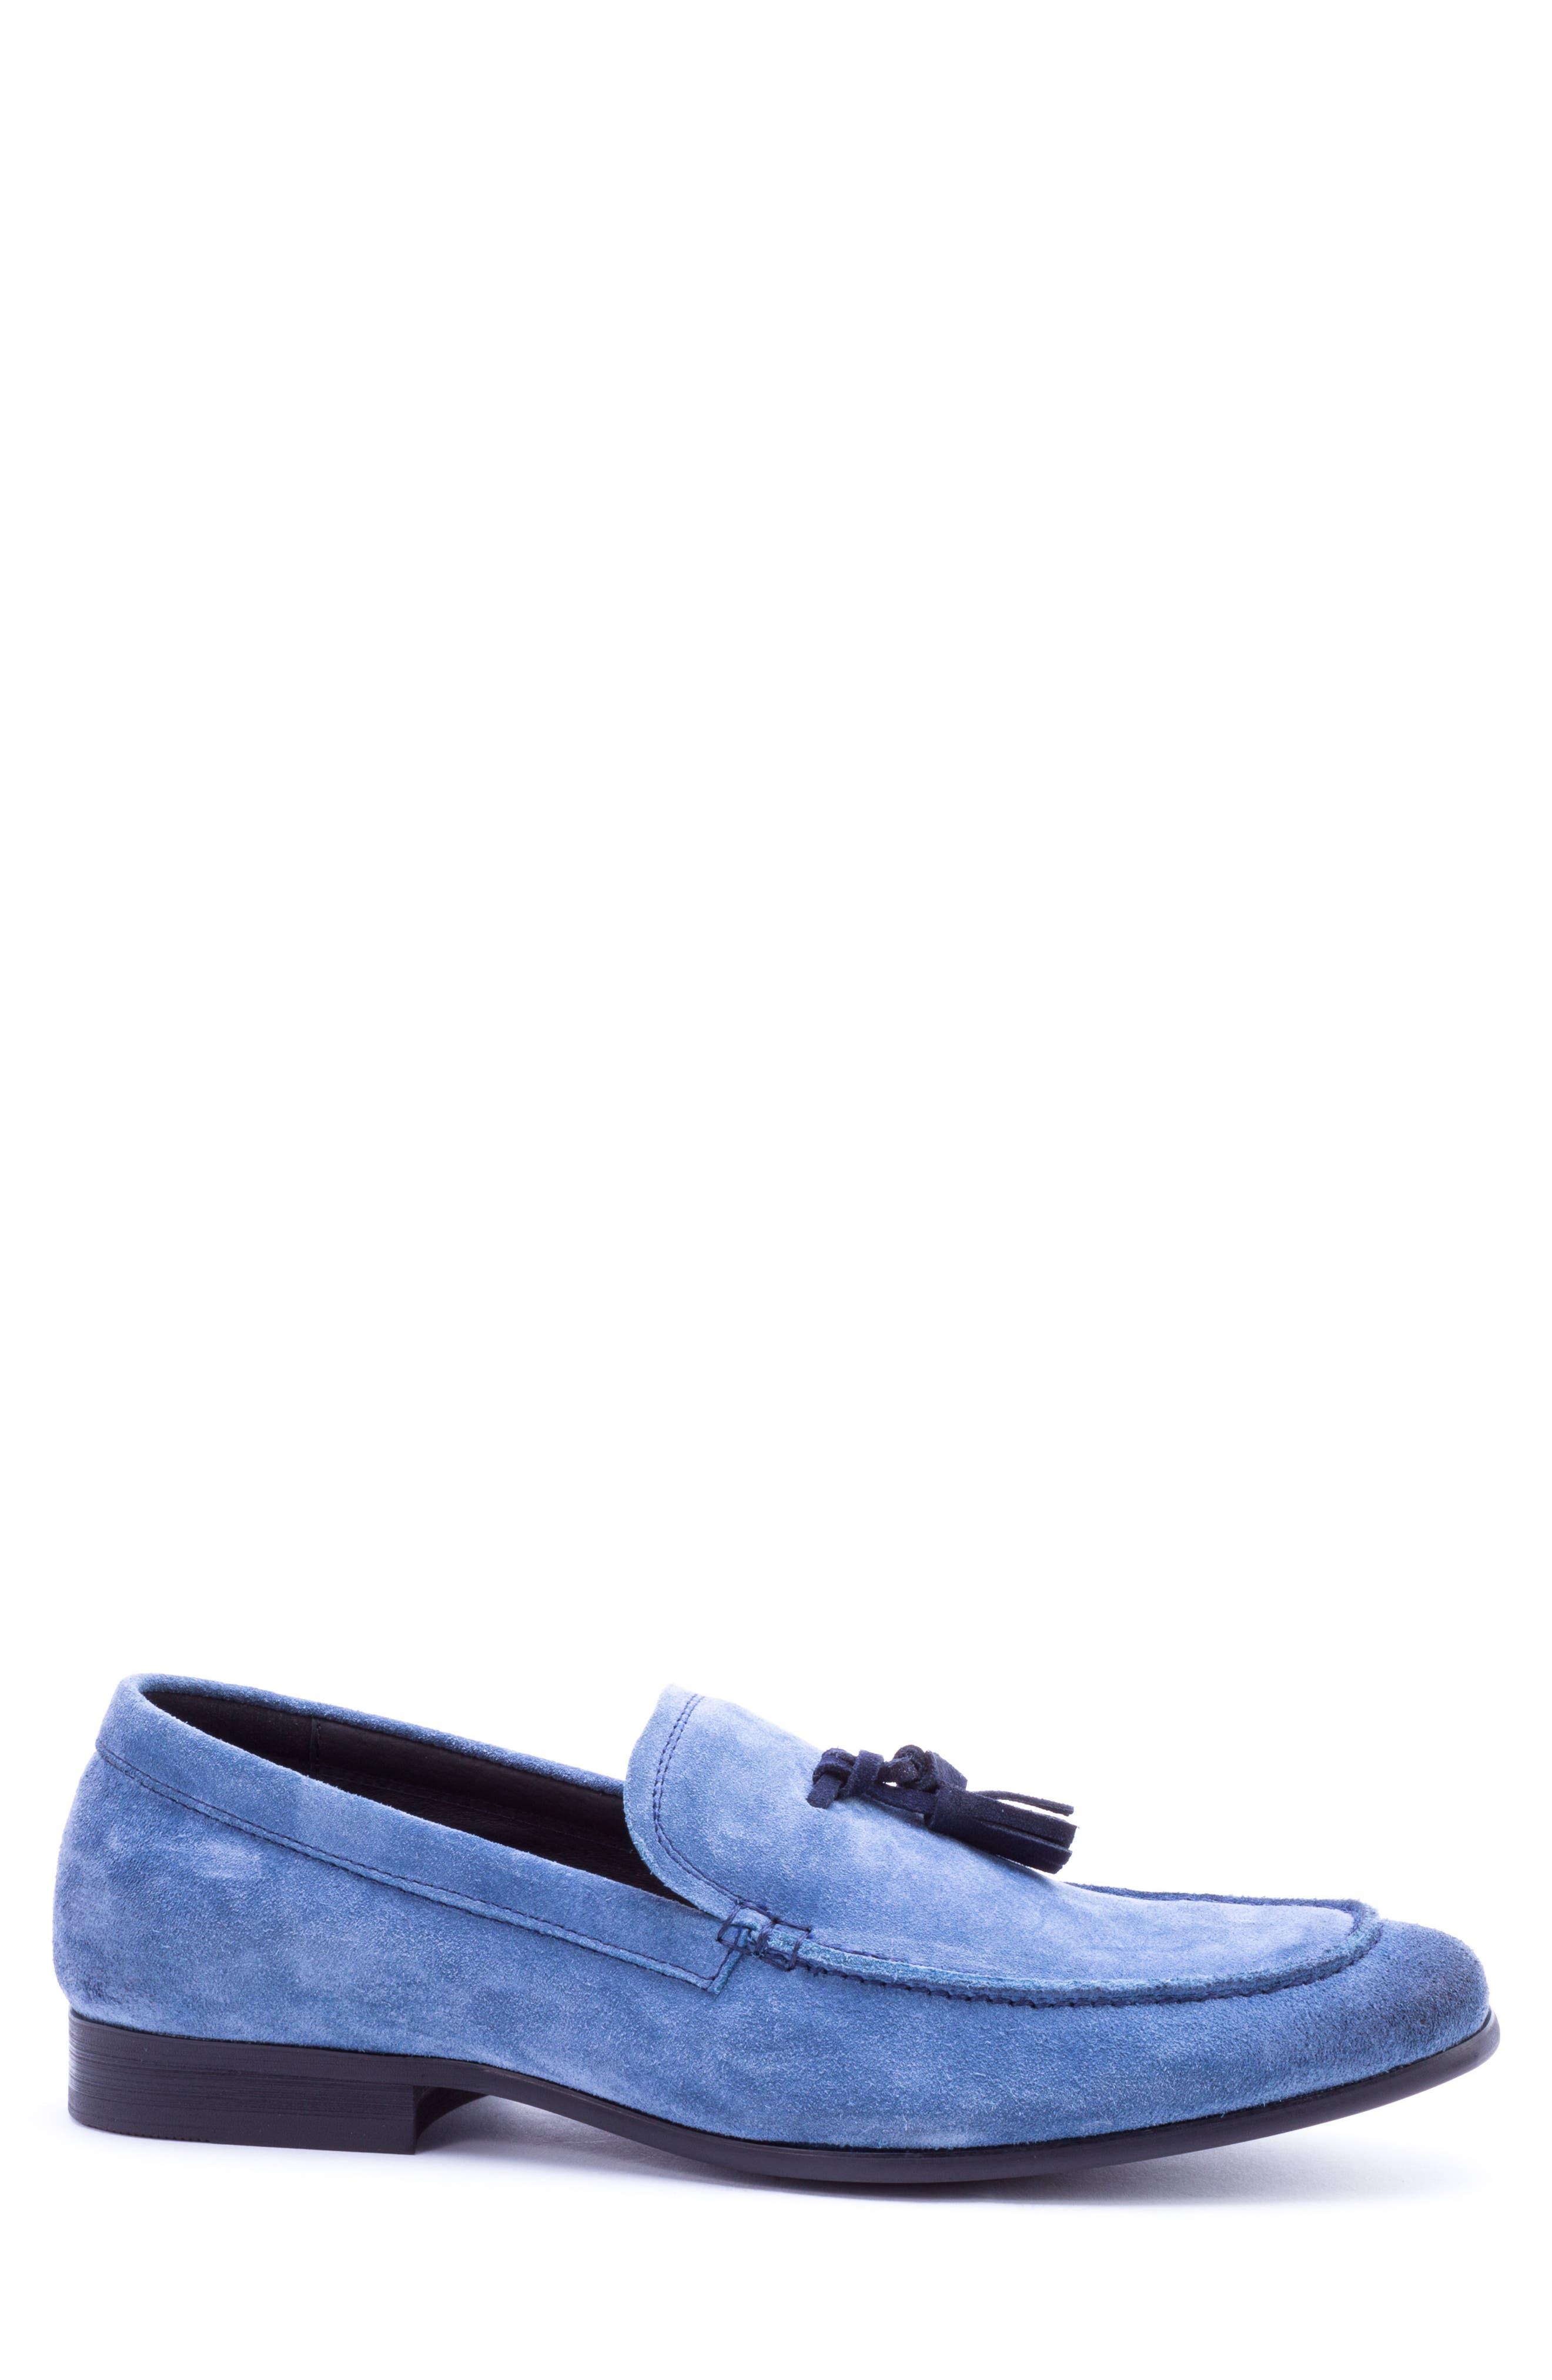 Severn Tassel Venetian Loafer,                             Alternate thumbnail 3, color,                             Blue Suede